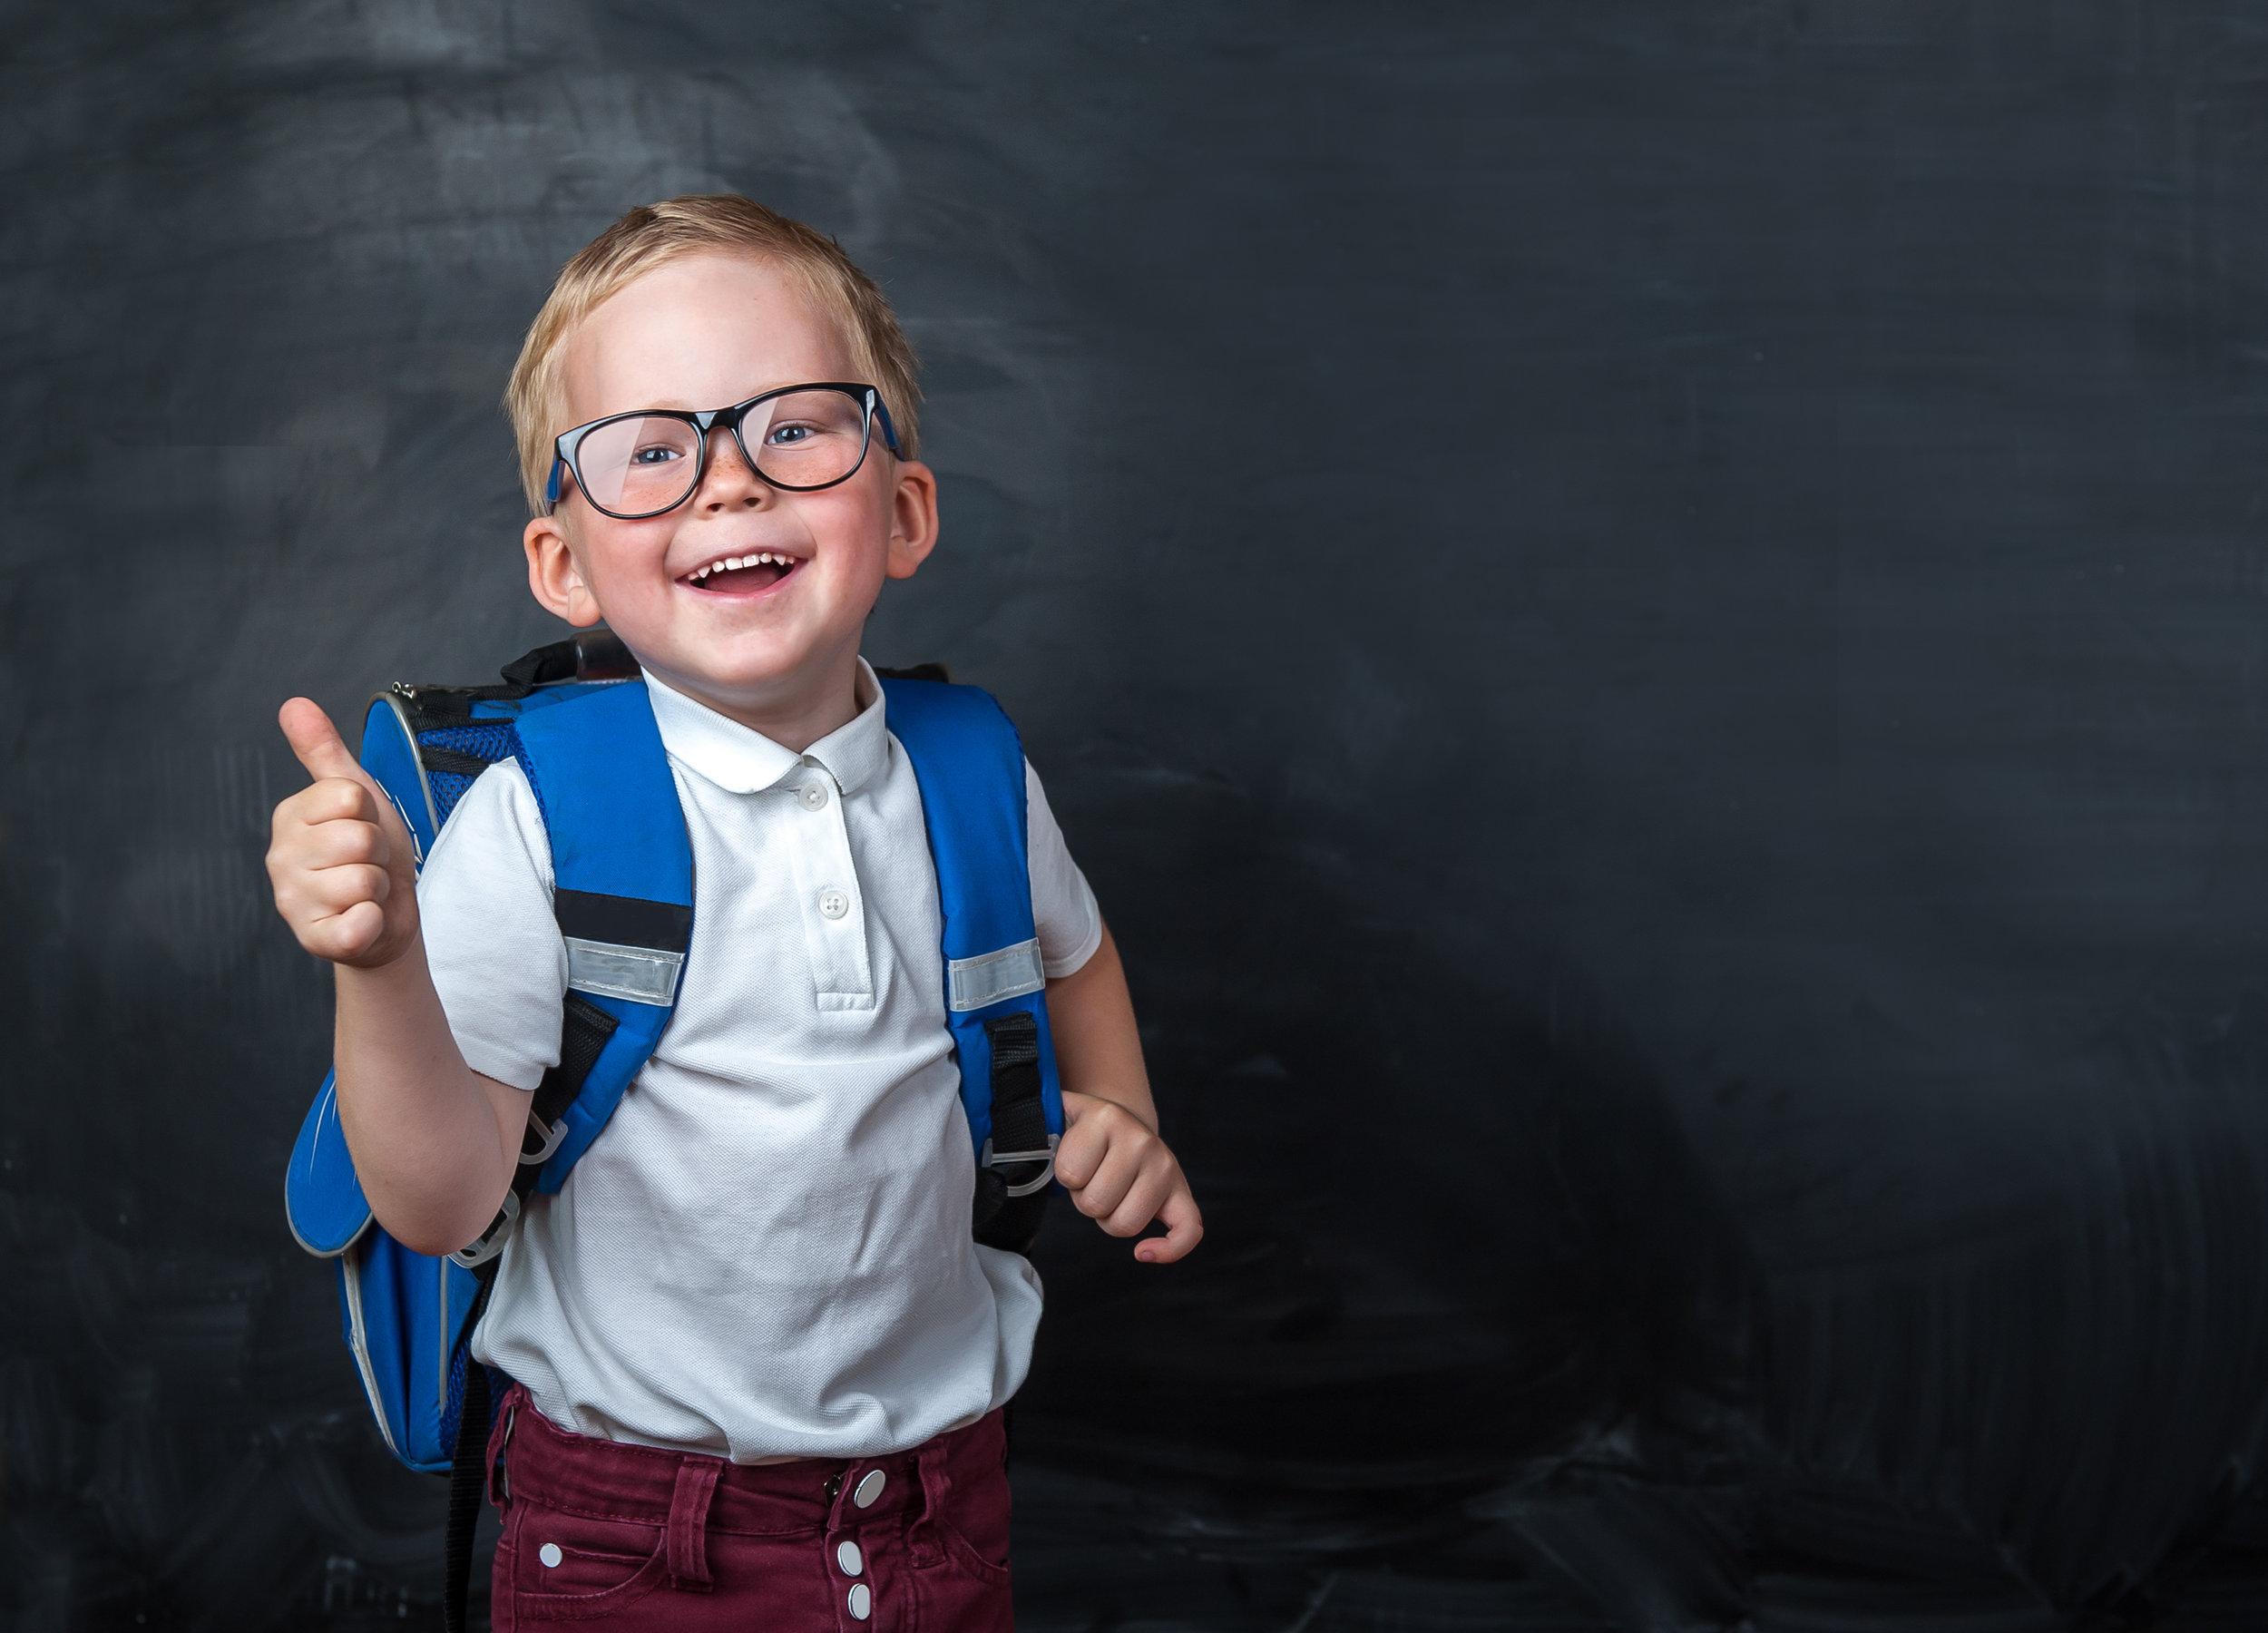 School Programming - For Parents, Teachers & Students